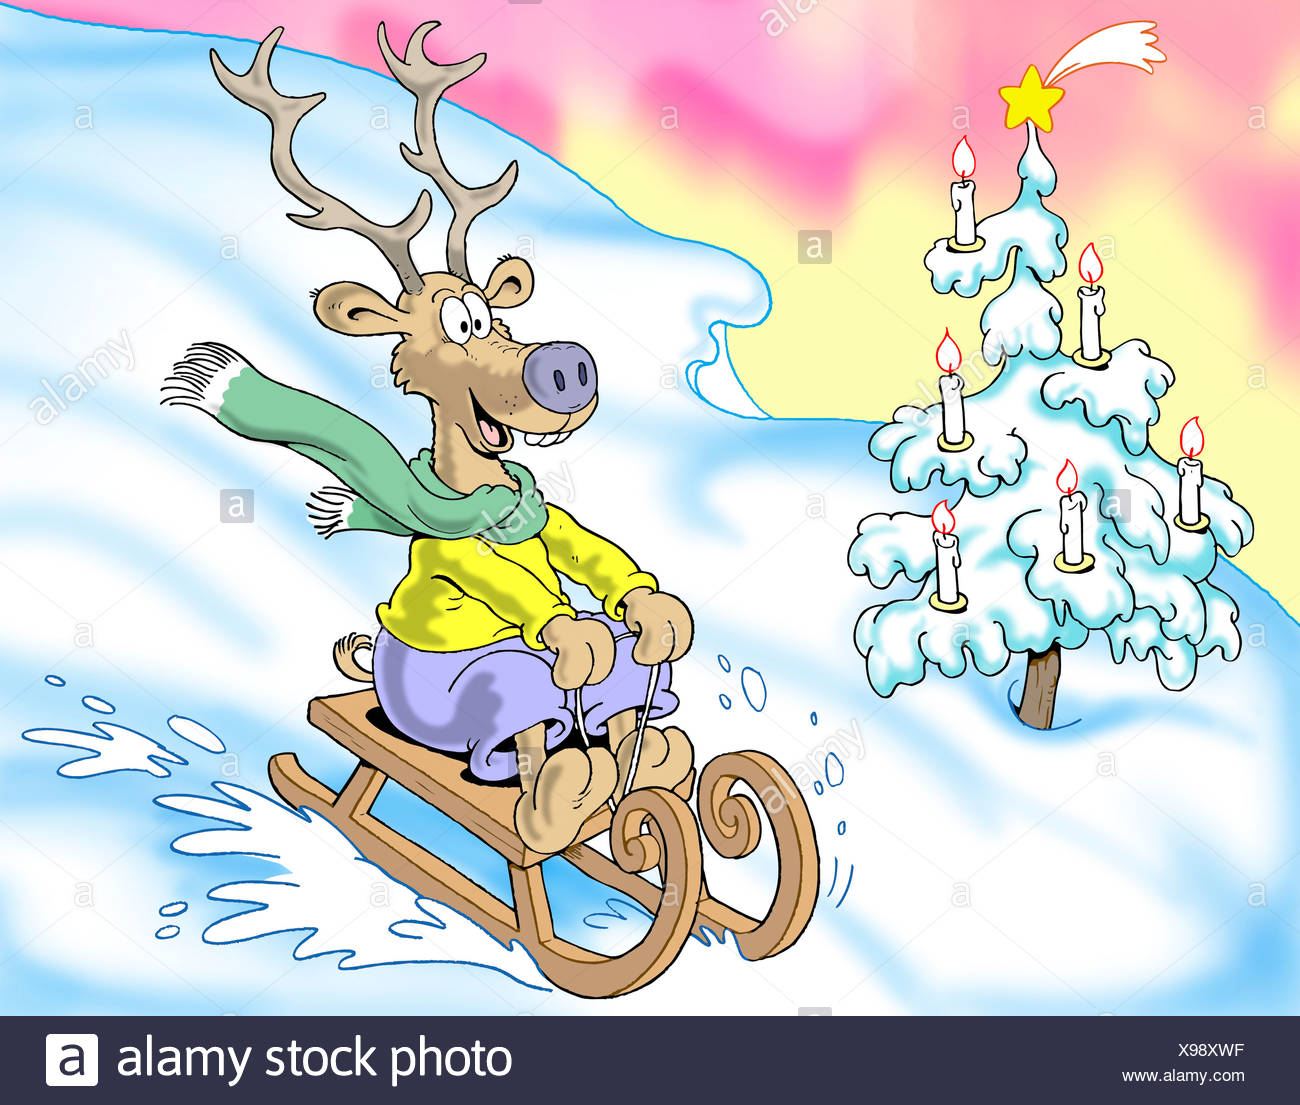 Sledging merry reindeer, illustration - Stock Image